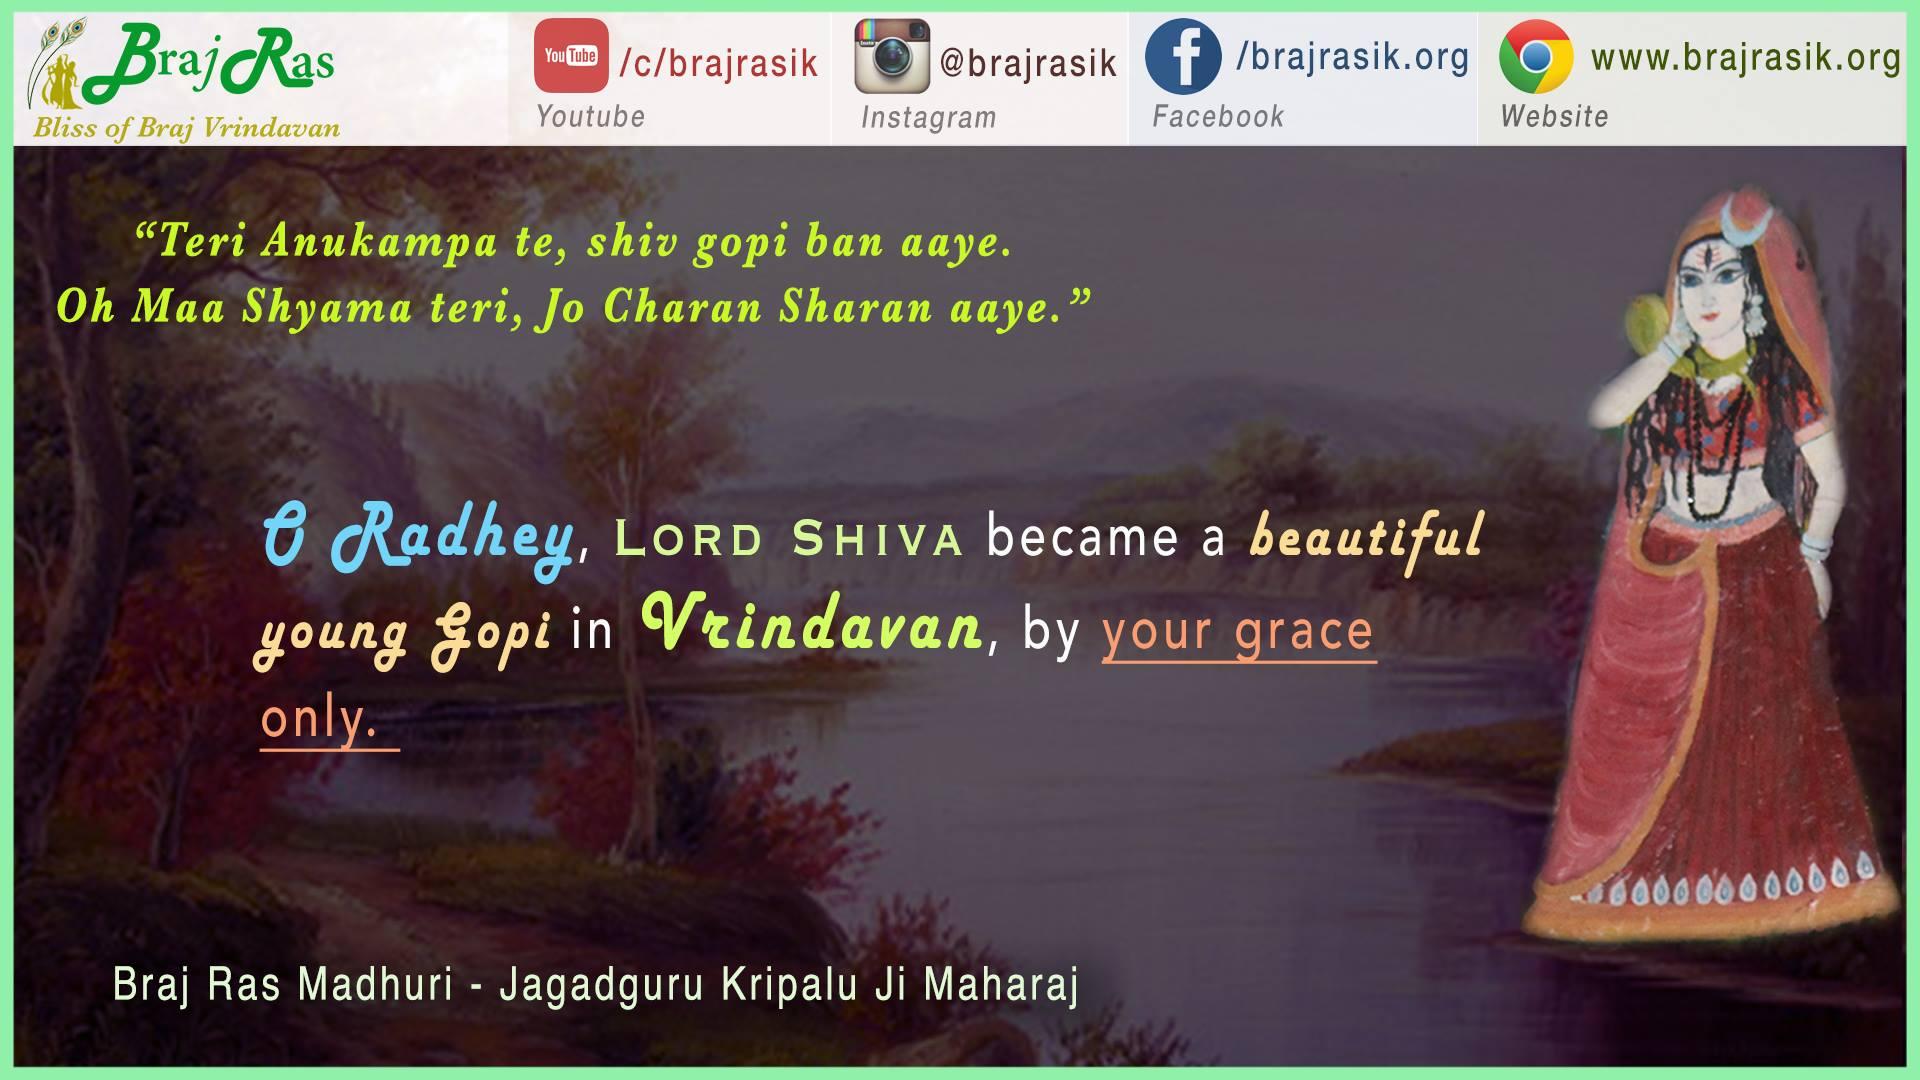 Teri Anukampa te, shiv gopi ban aaye  - Braj Ras Madhuri - Jagadguru Kripalu Ji Maharaj